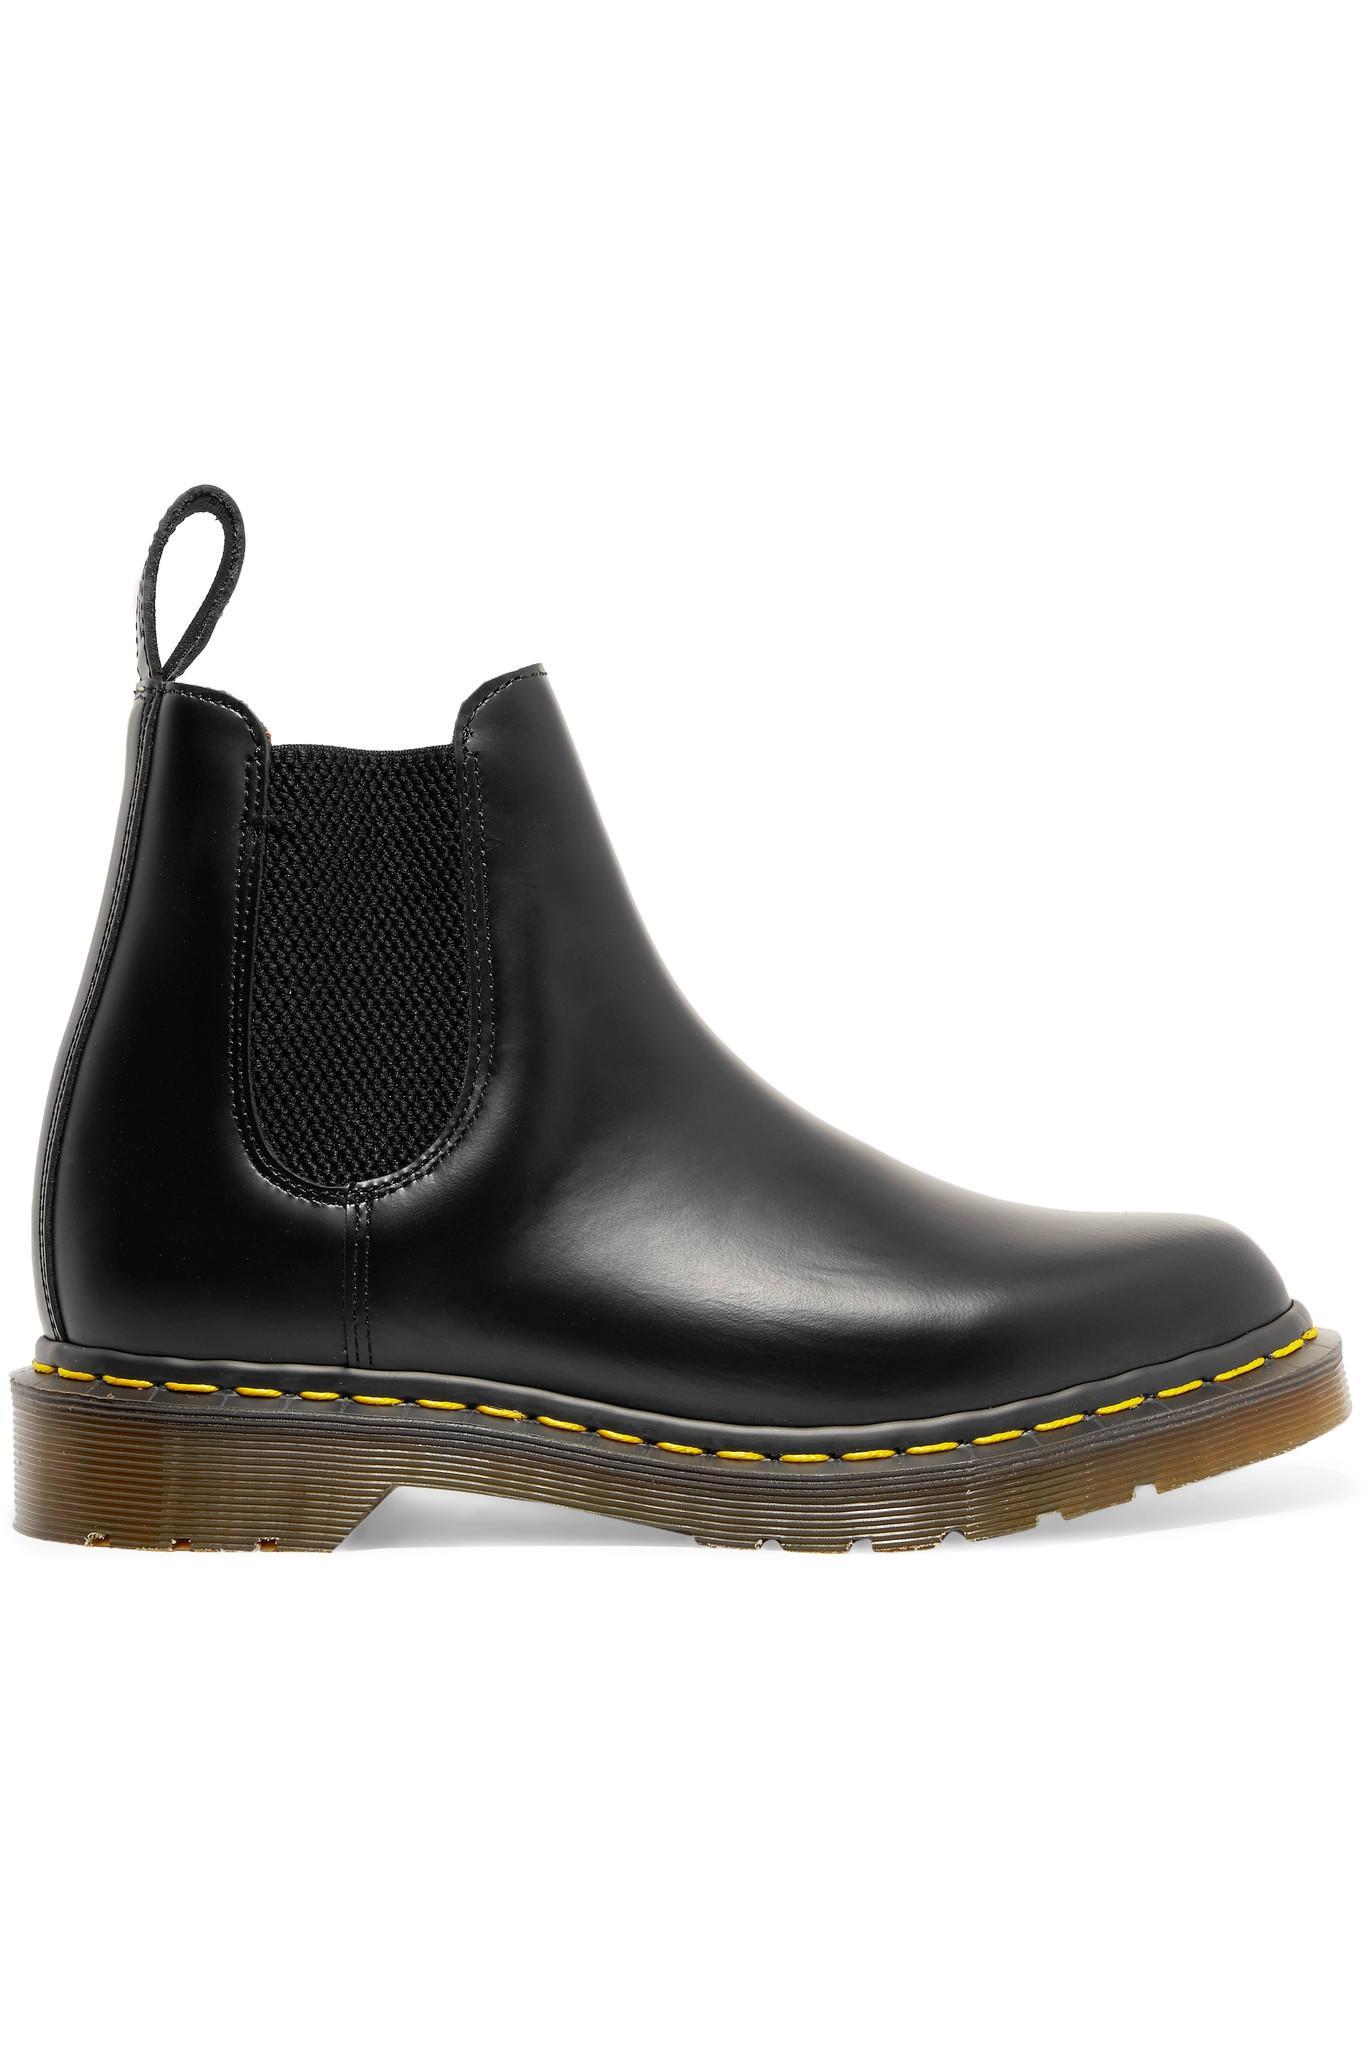 67baa66634c Comme des Garçons + Dr Martens Leather Chelsea Boots in Black - Lyst